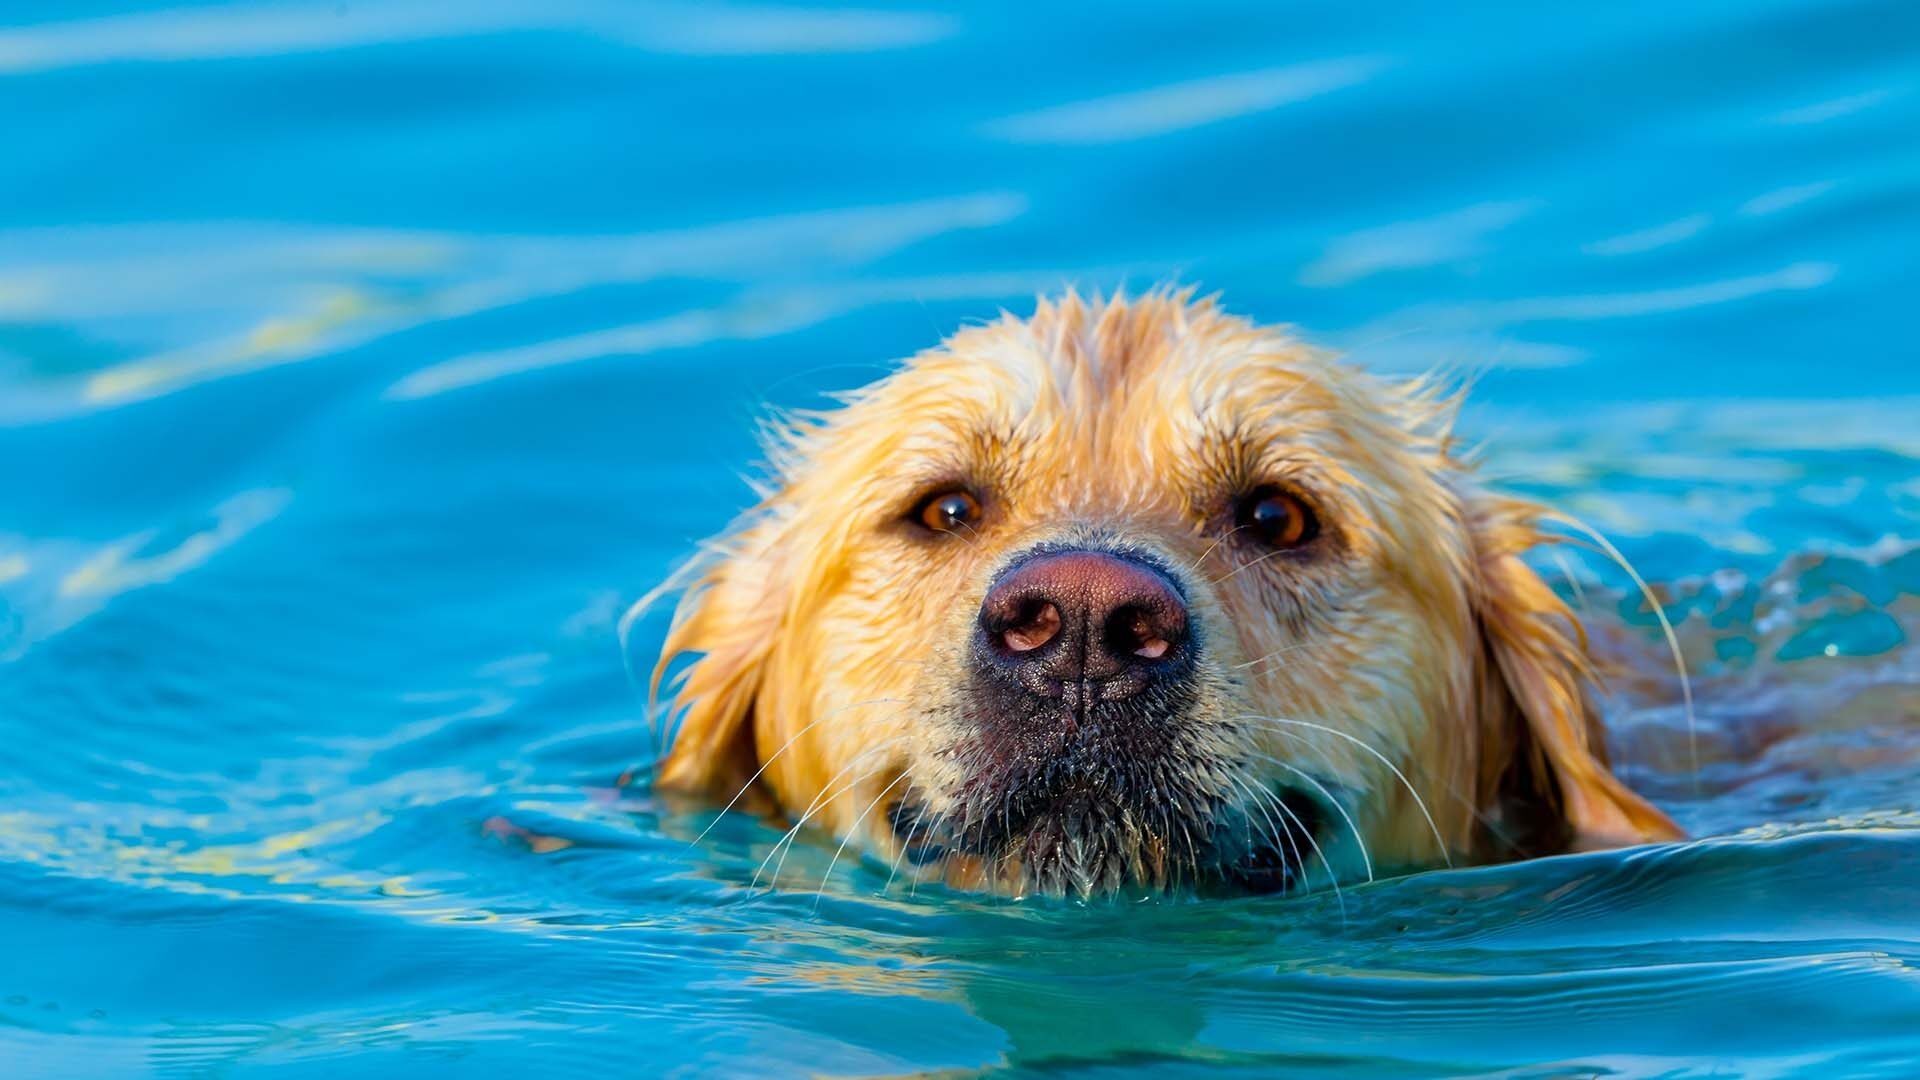 Golden Retriever swimming in pool.